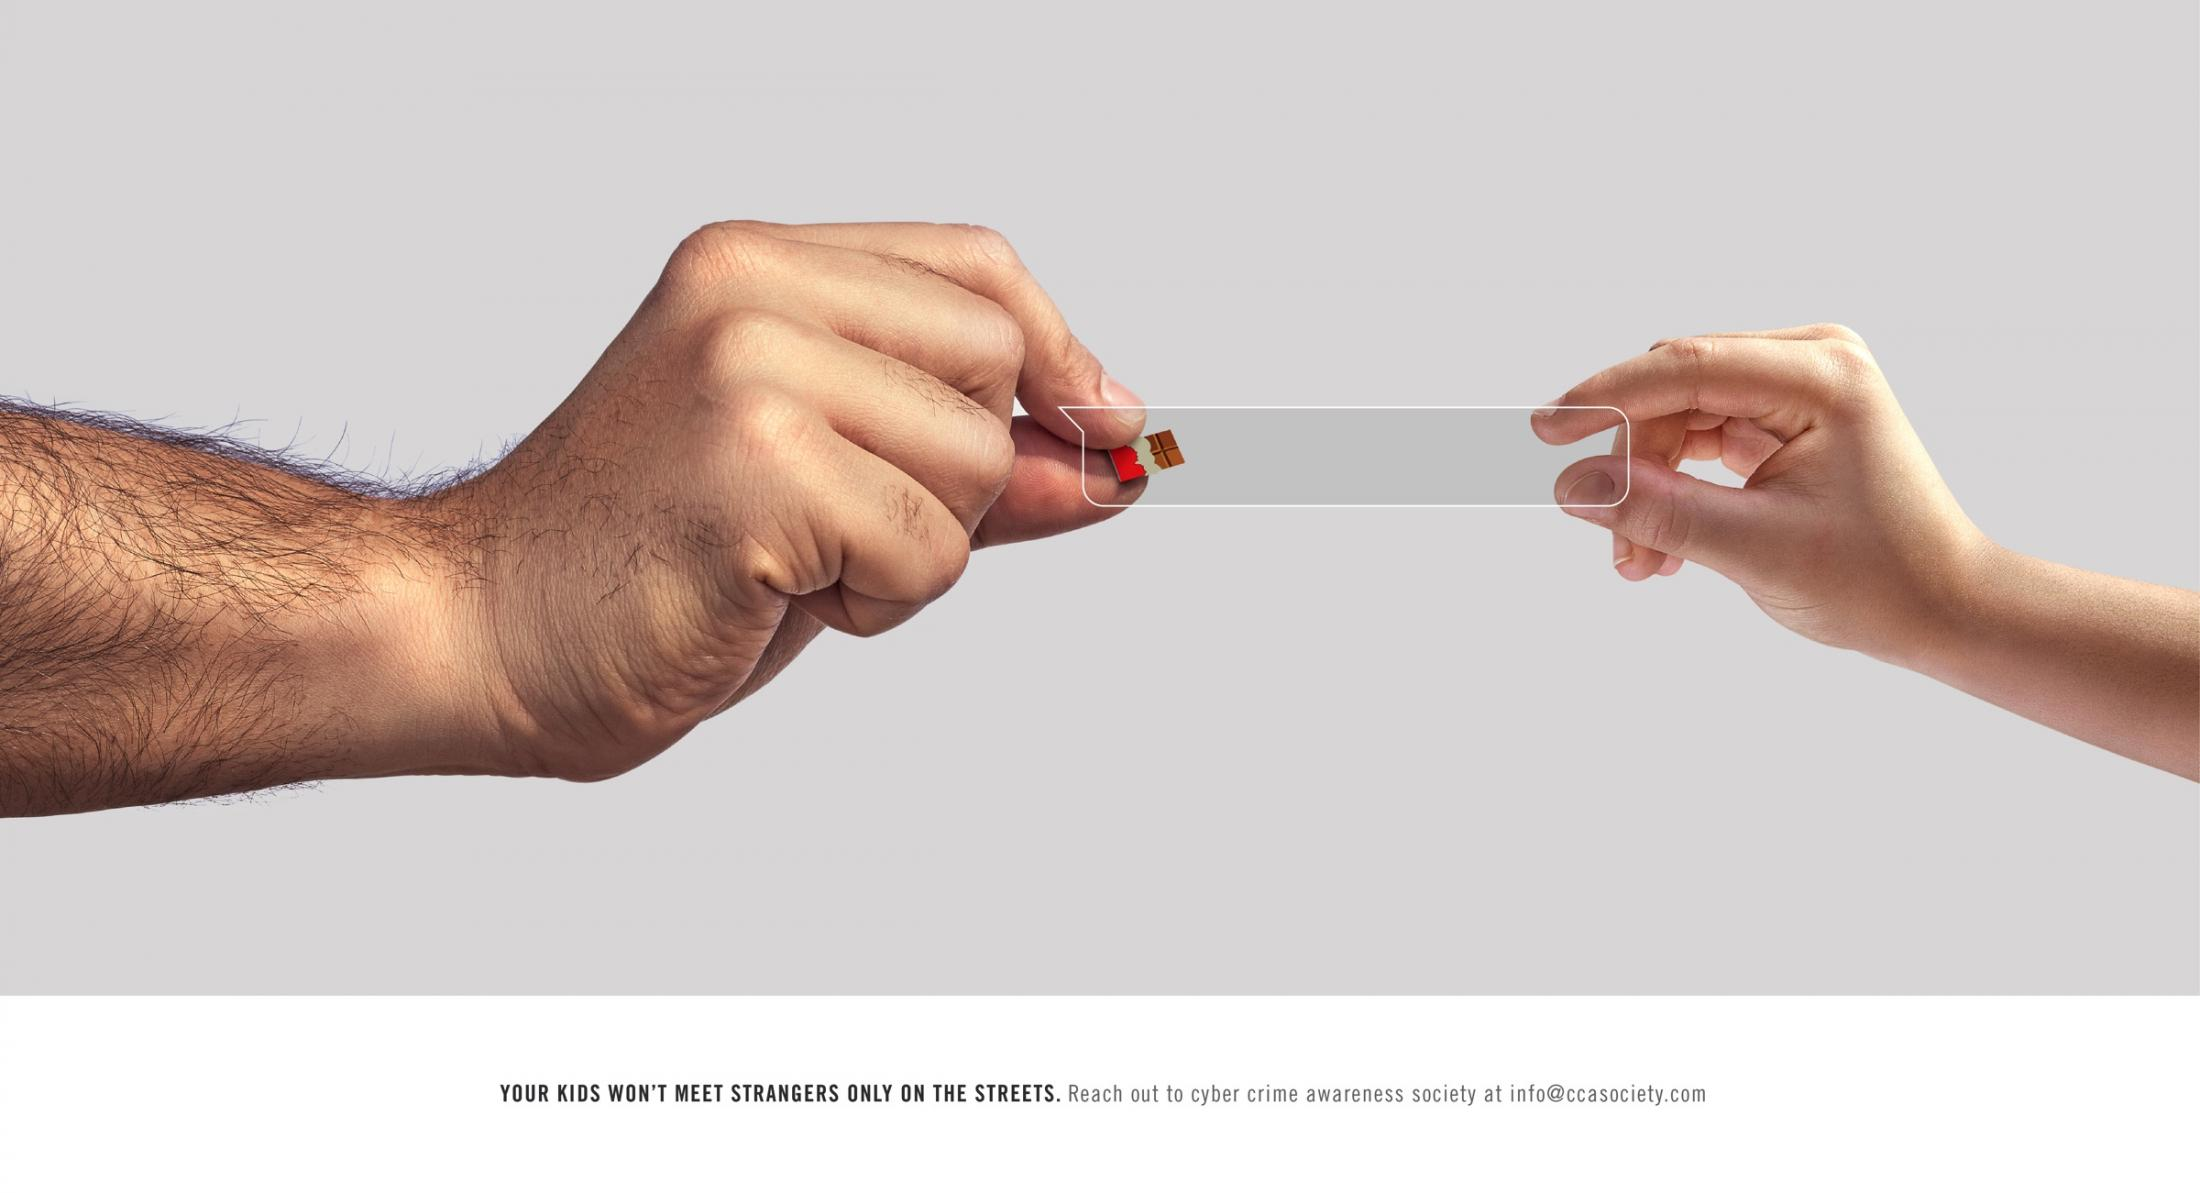 Cyber Crime Awareness Society Print Ad - Online Predators, Chocolate